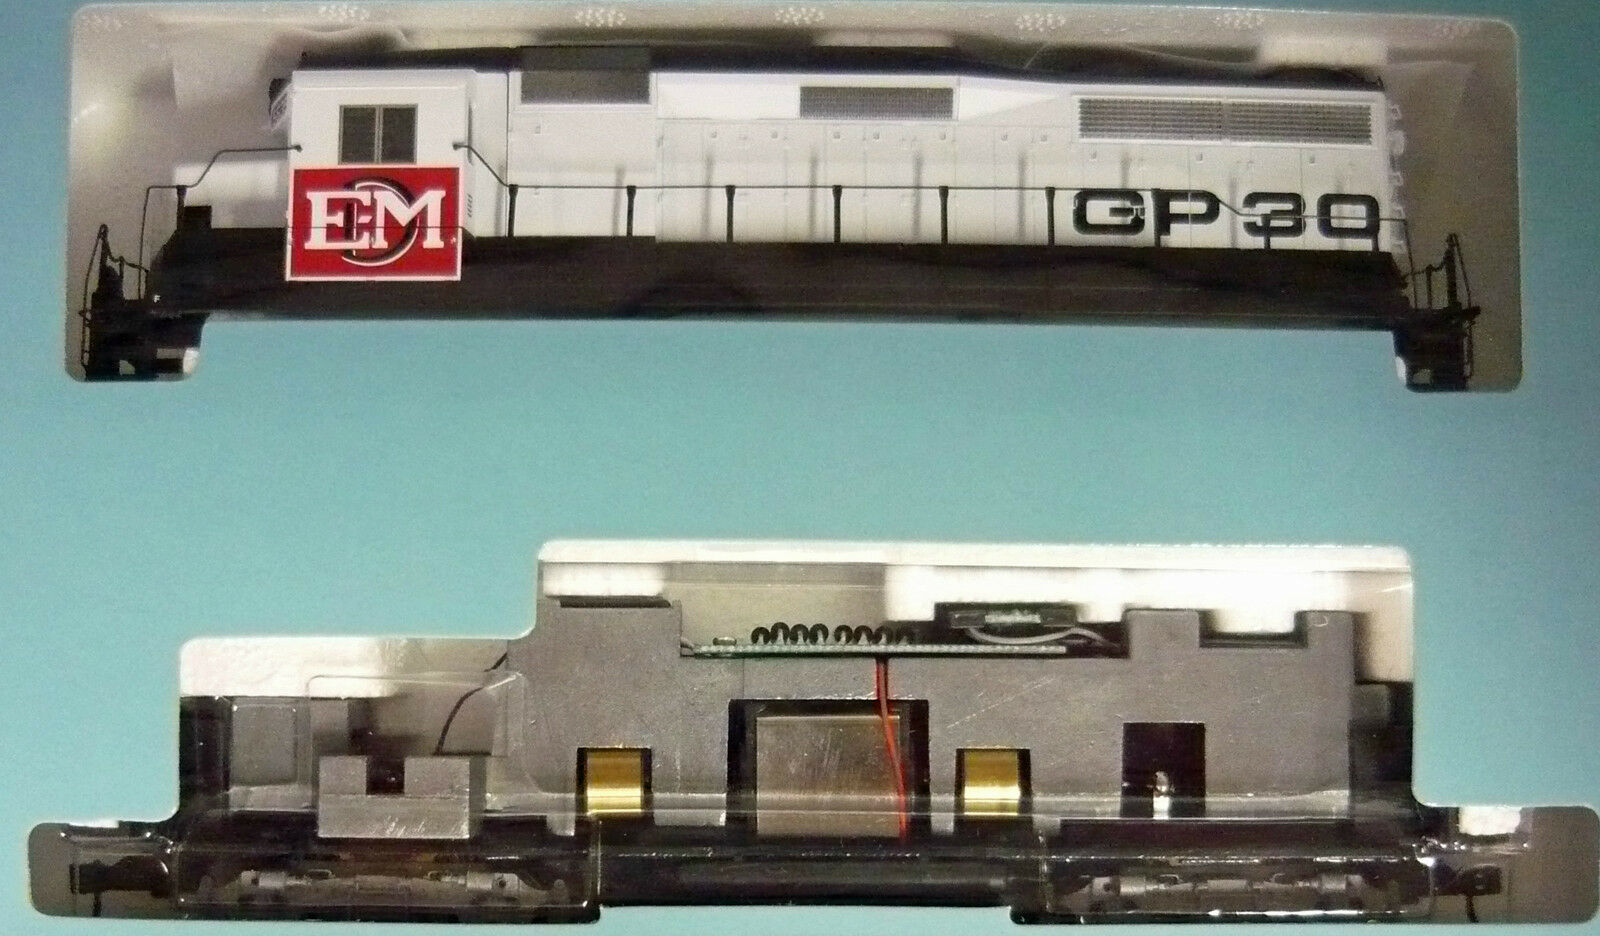 Life LIKE ProssoO 2000 21522 gp30 locomotive EMD  5639 NUOVO & In Scatola Originale